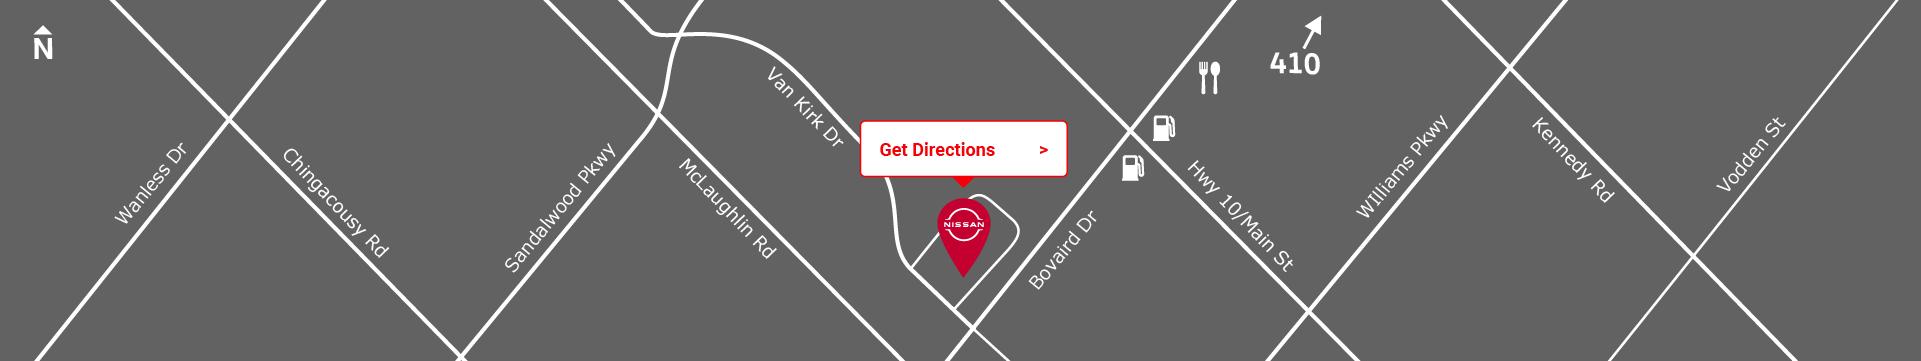 Footer custom desktop map